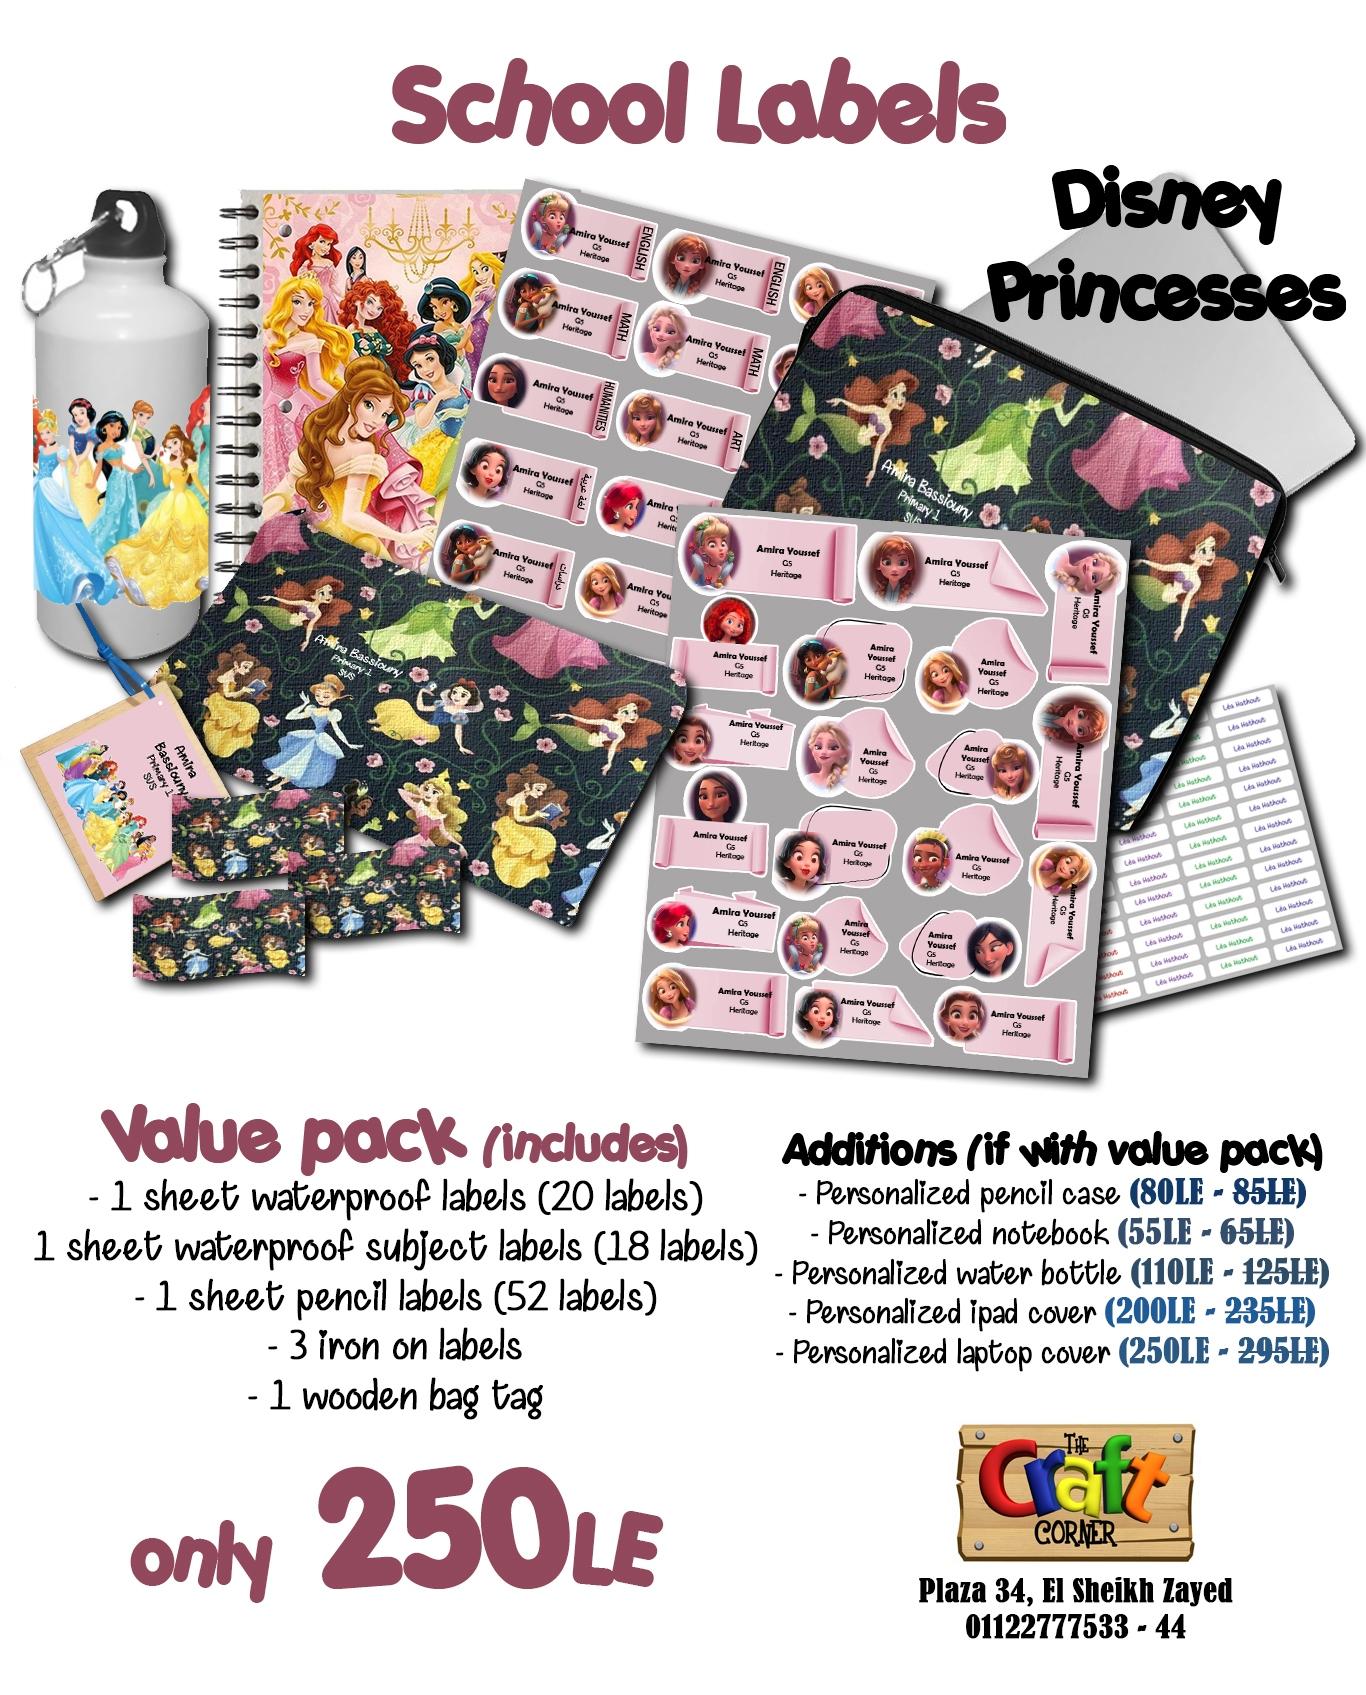 Disney princesses ad